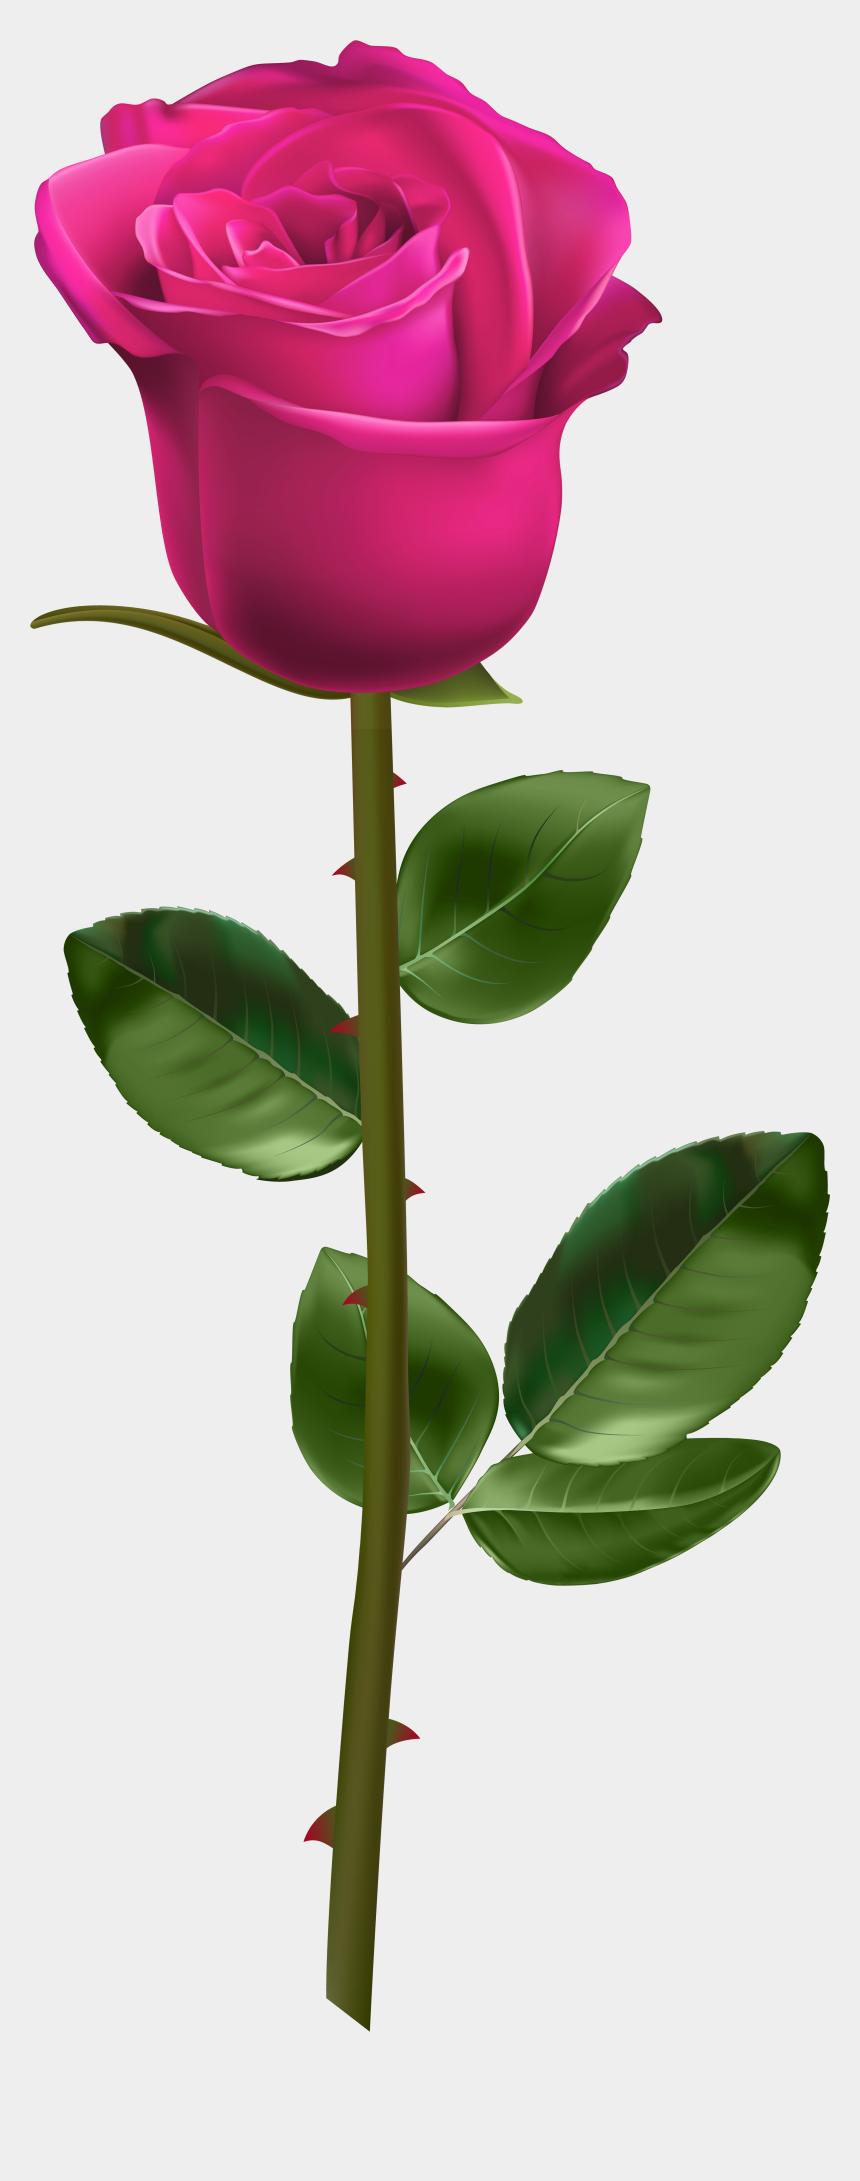 stem clipart, Cartoons - Clip Art Pink Roses - Red Rose With Stem